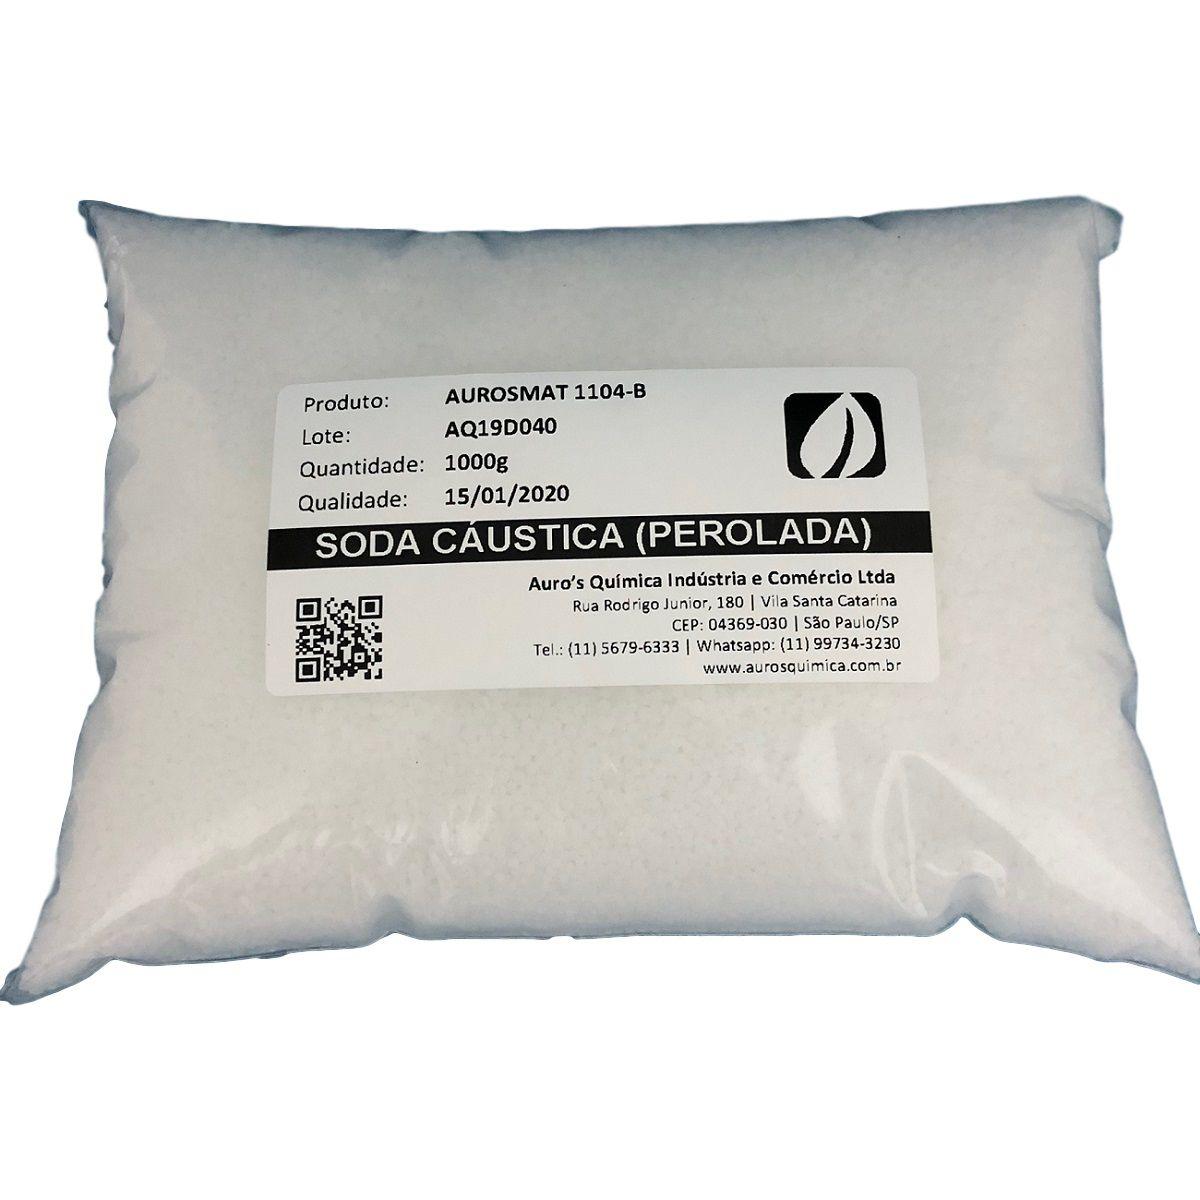 Soda Cáustica Perolada 99% - 50 Pacotes 1 Kg